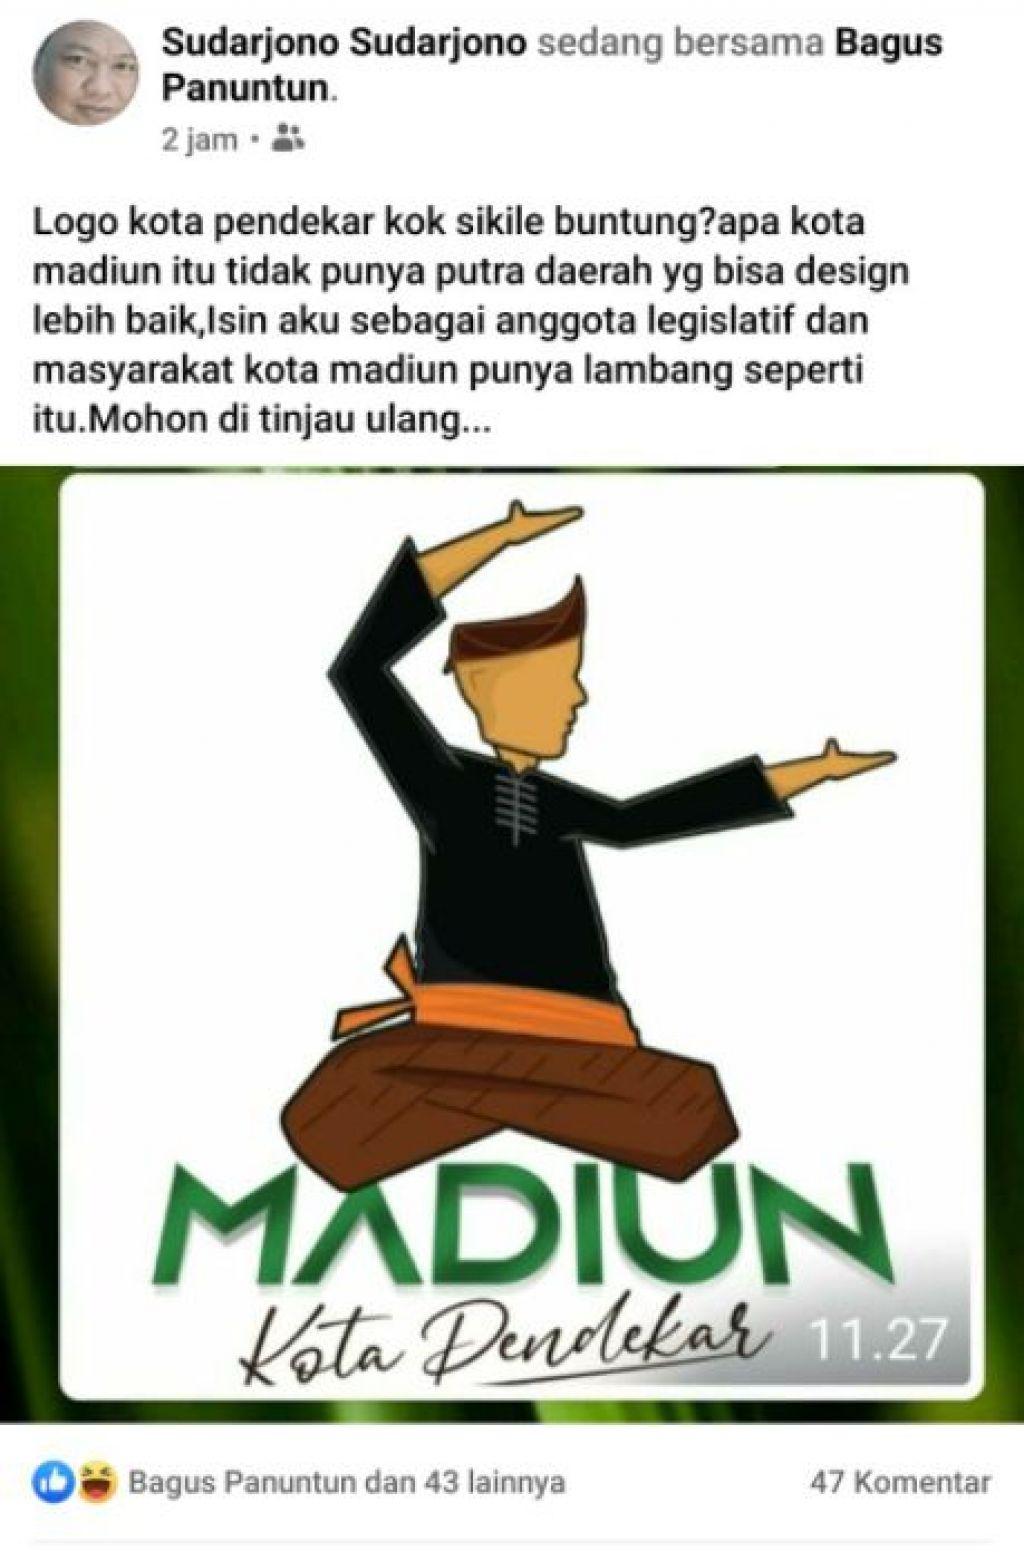 Salah satu netizen mengkritik logo Madiun Kota Pendekar